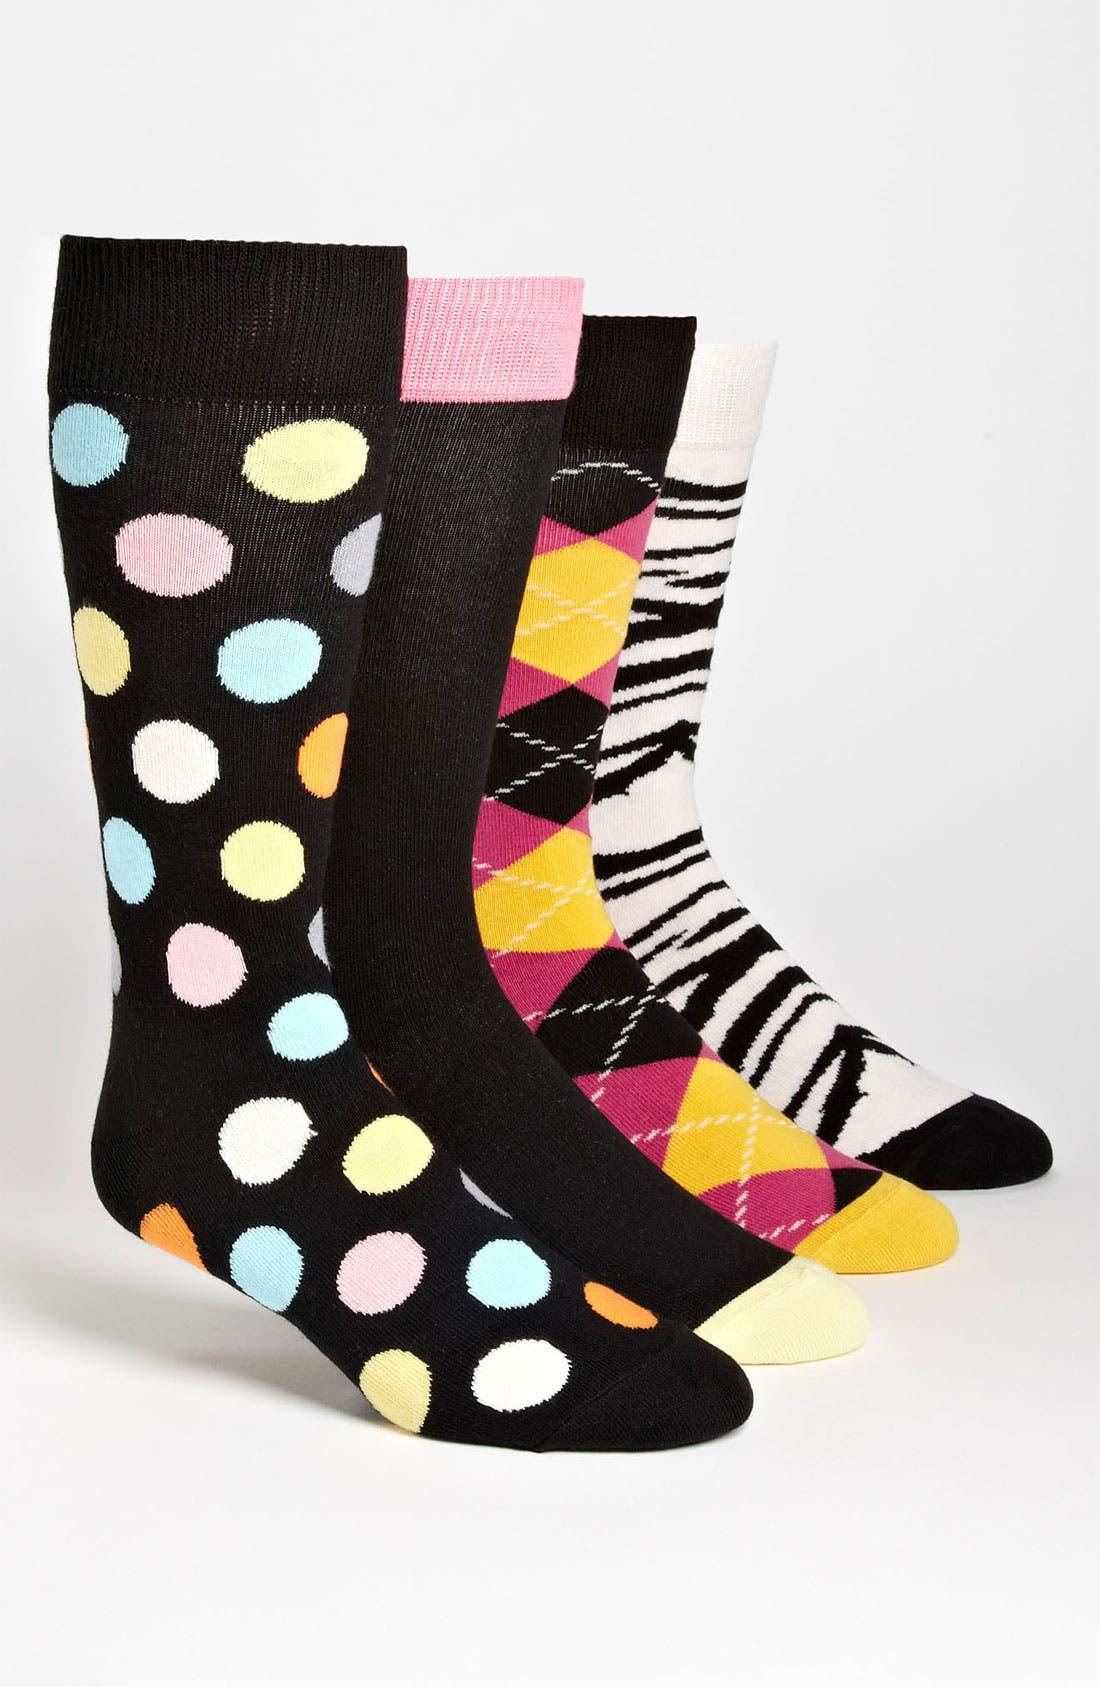 Alternate Image 1 Selected - Happy Socks Cotton Blend Sock Set (4-Pack)